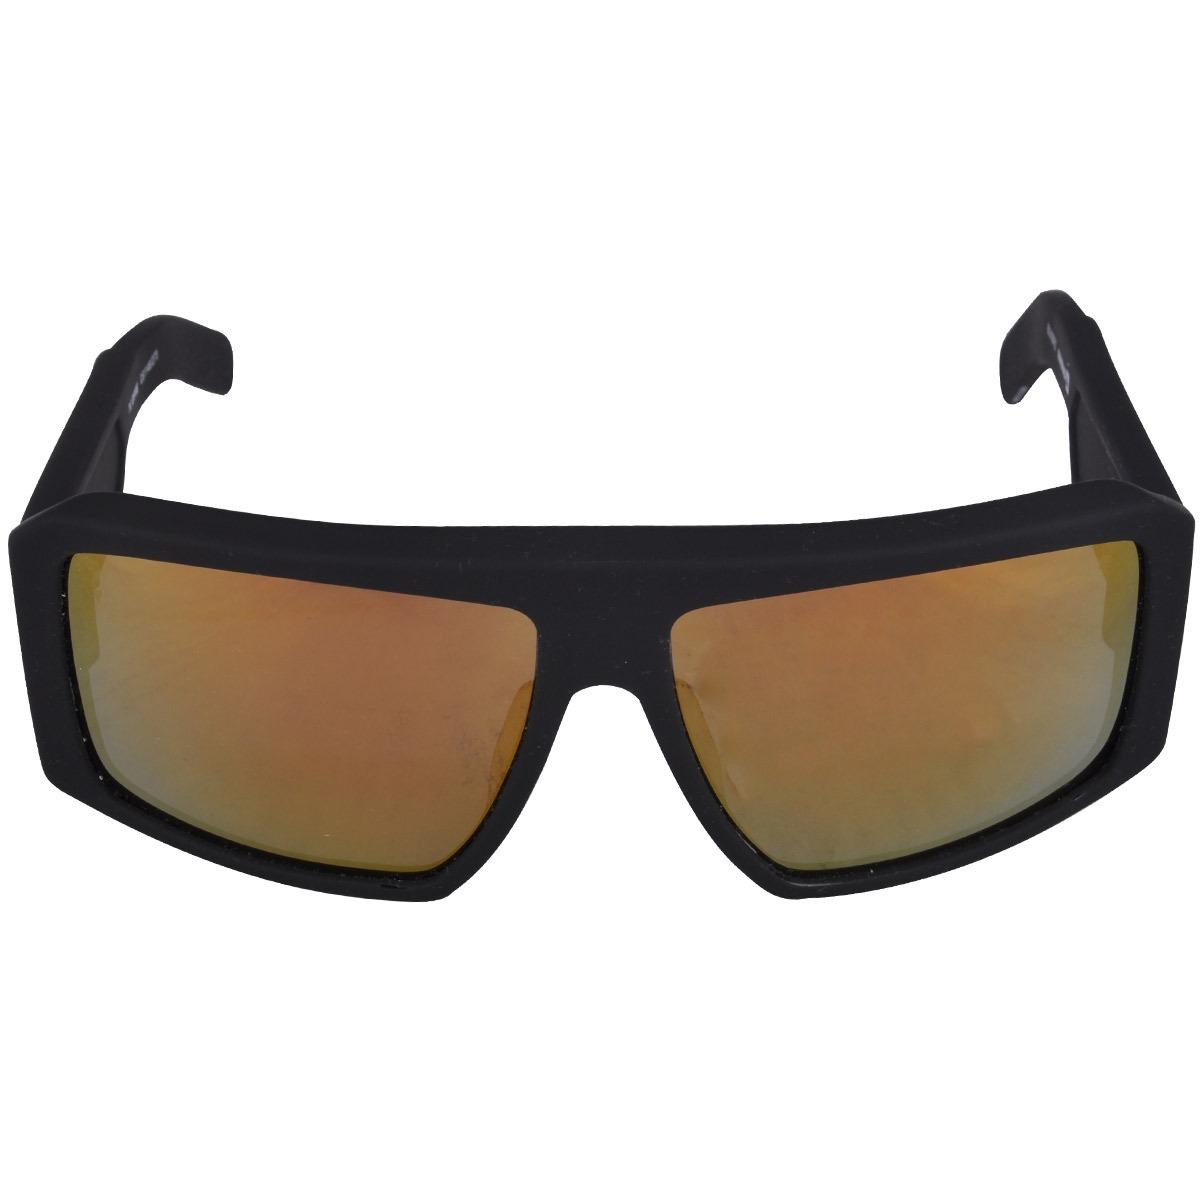 Óculos Quiksilver The Empire Ii Preto - Cut Wave - R  119,90 em ... 20fb9e3198